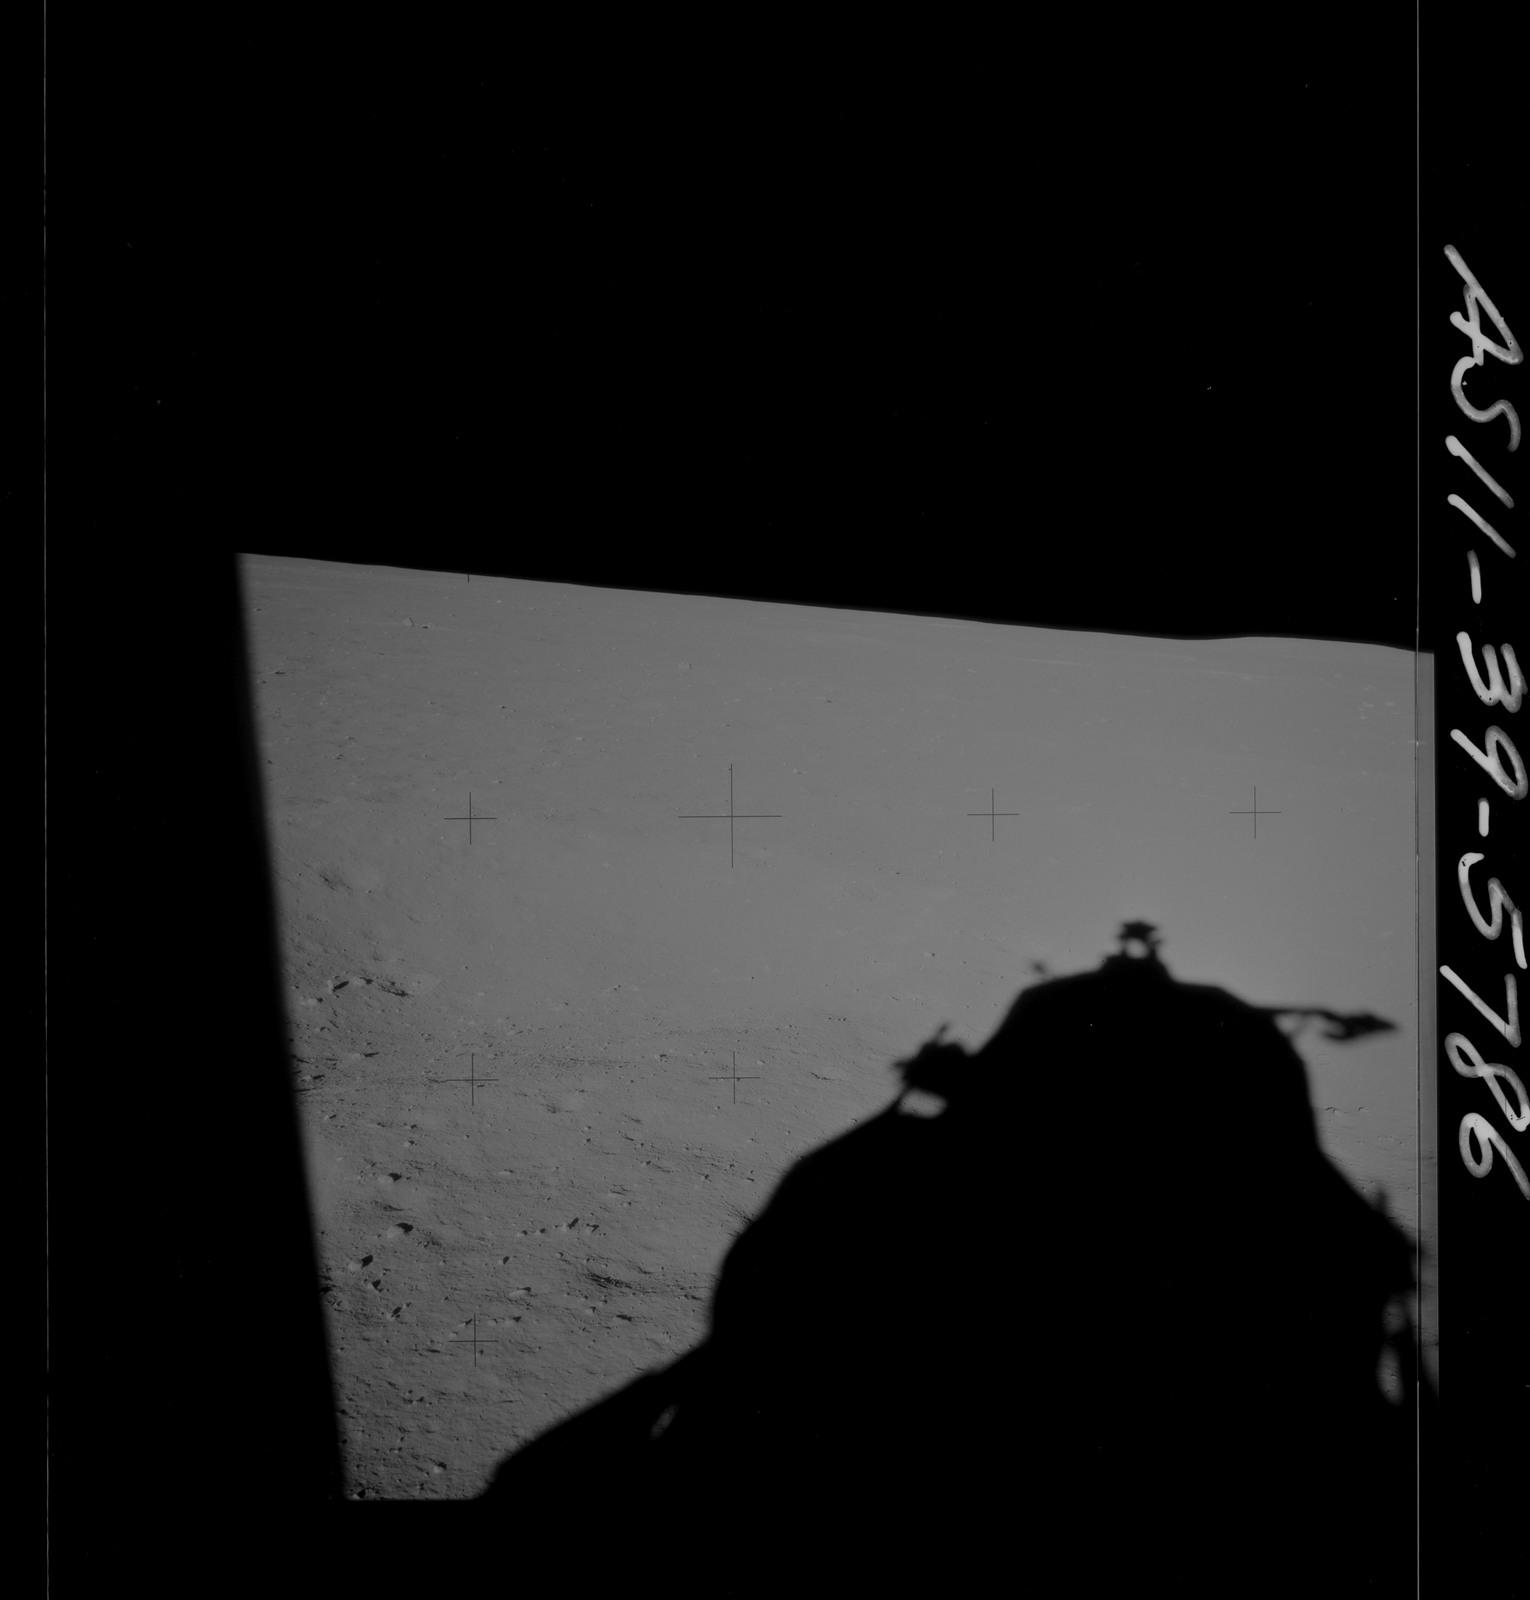 AS11-39-5786 - Apollo 11 - Apollo 11 Mission image - Shadow of Lunar Module on lunar surface